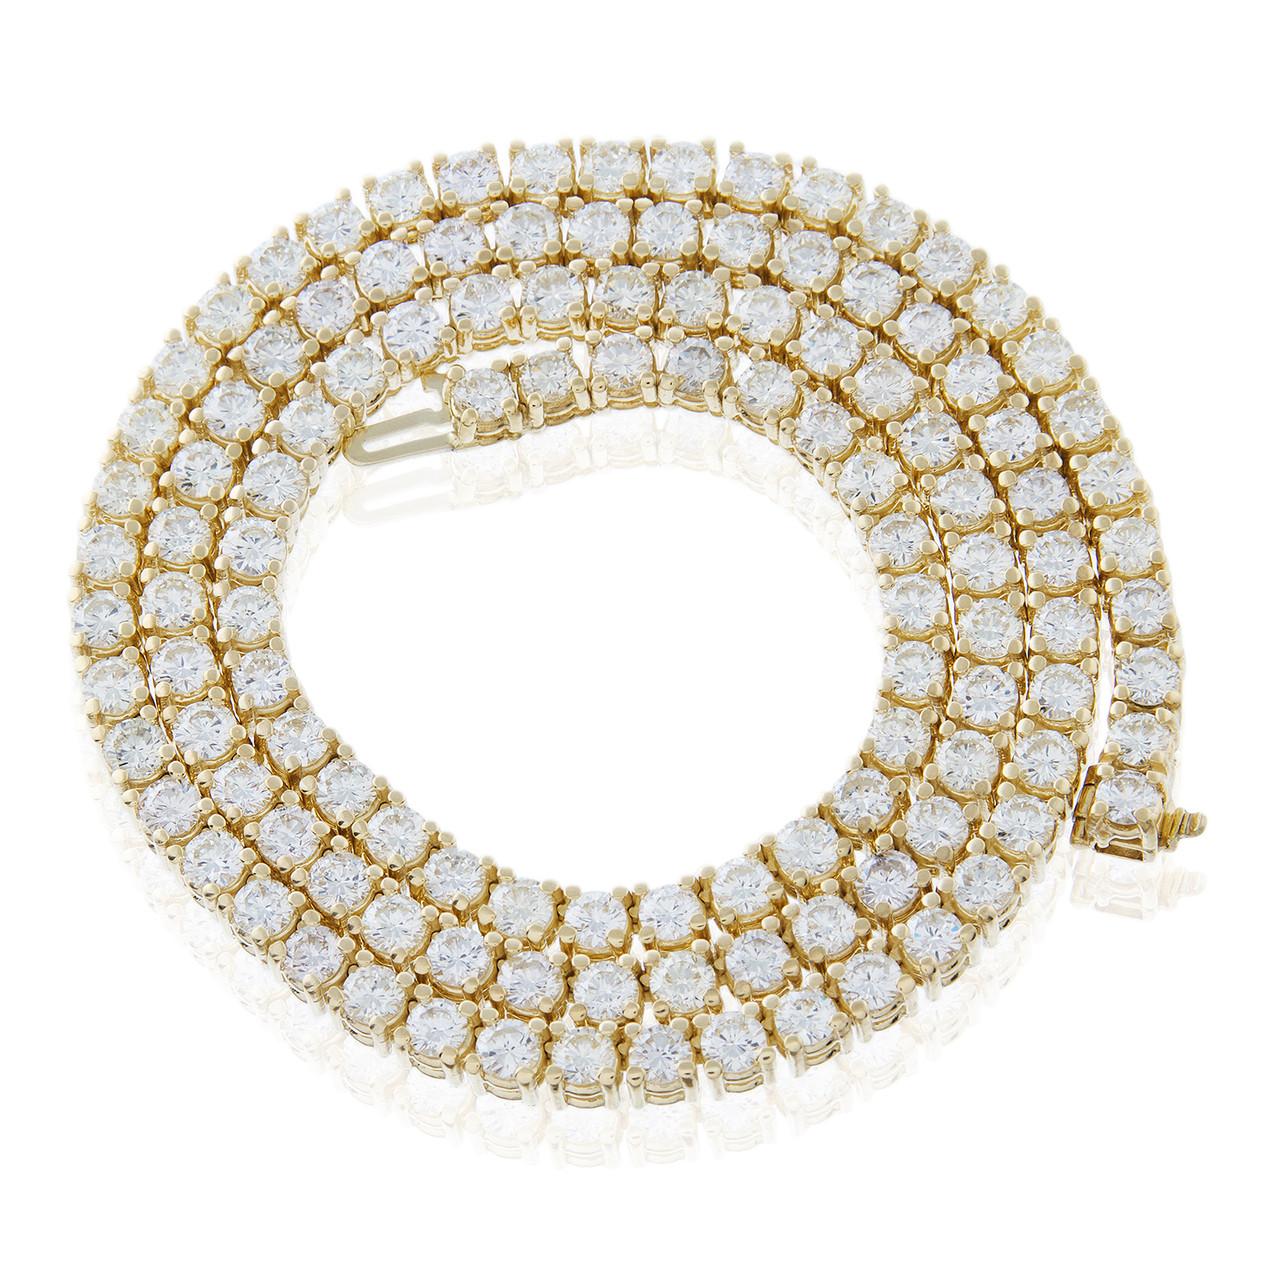 2be8fdc8ff40c 14k Yellow Gold 28ct Diamond Tennis Chain 26.5in